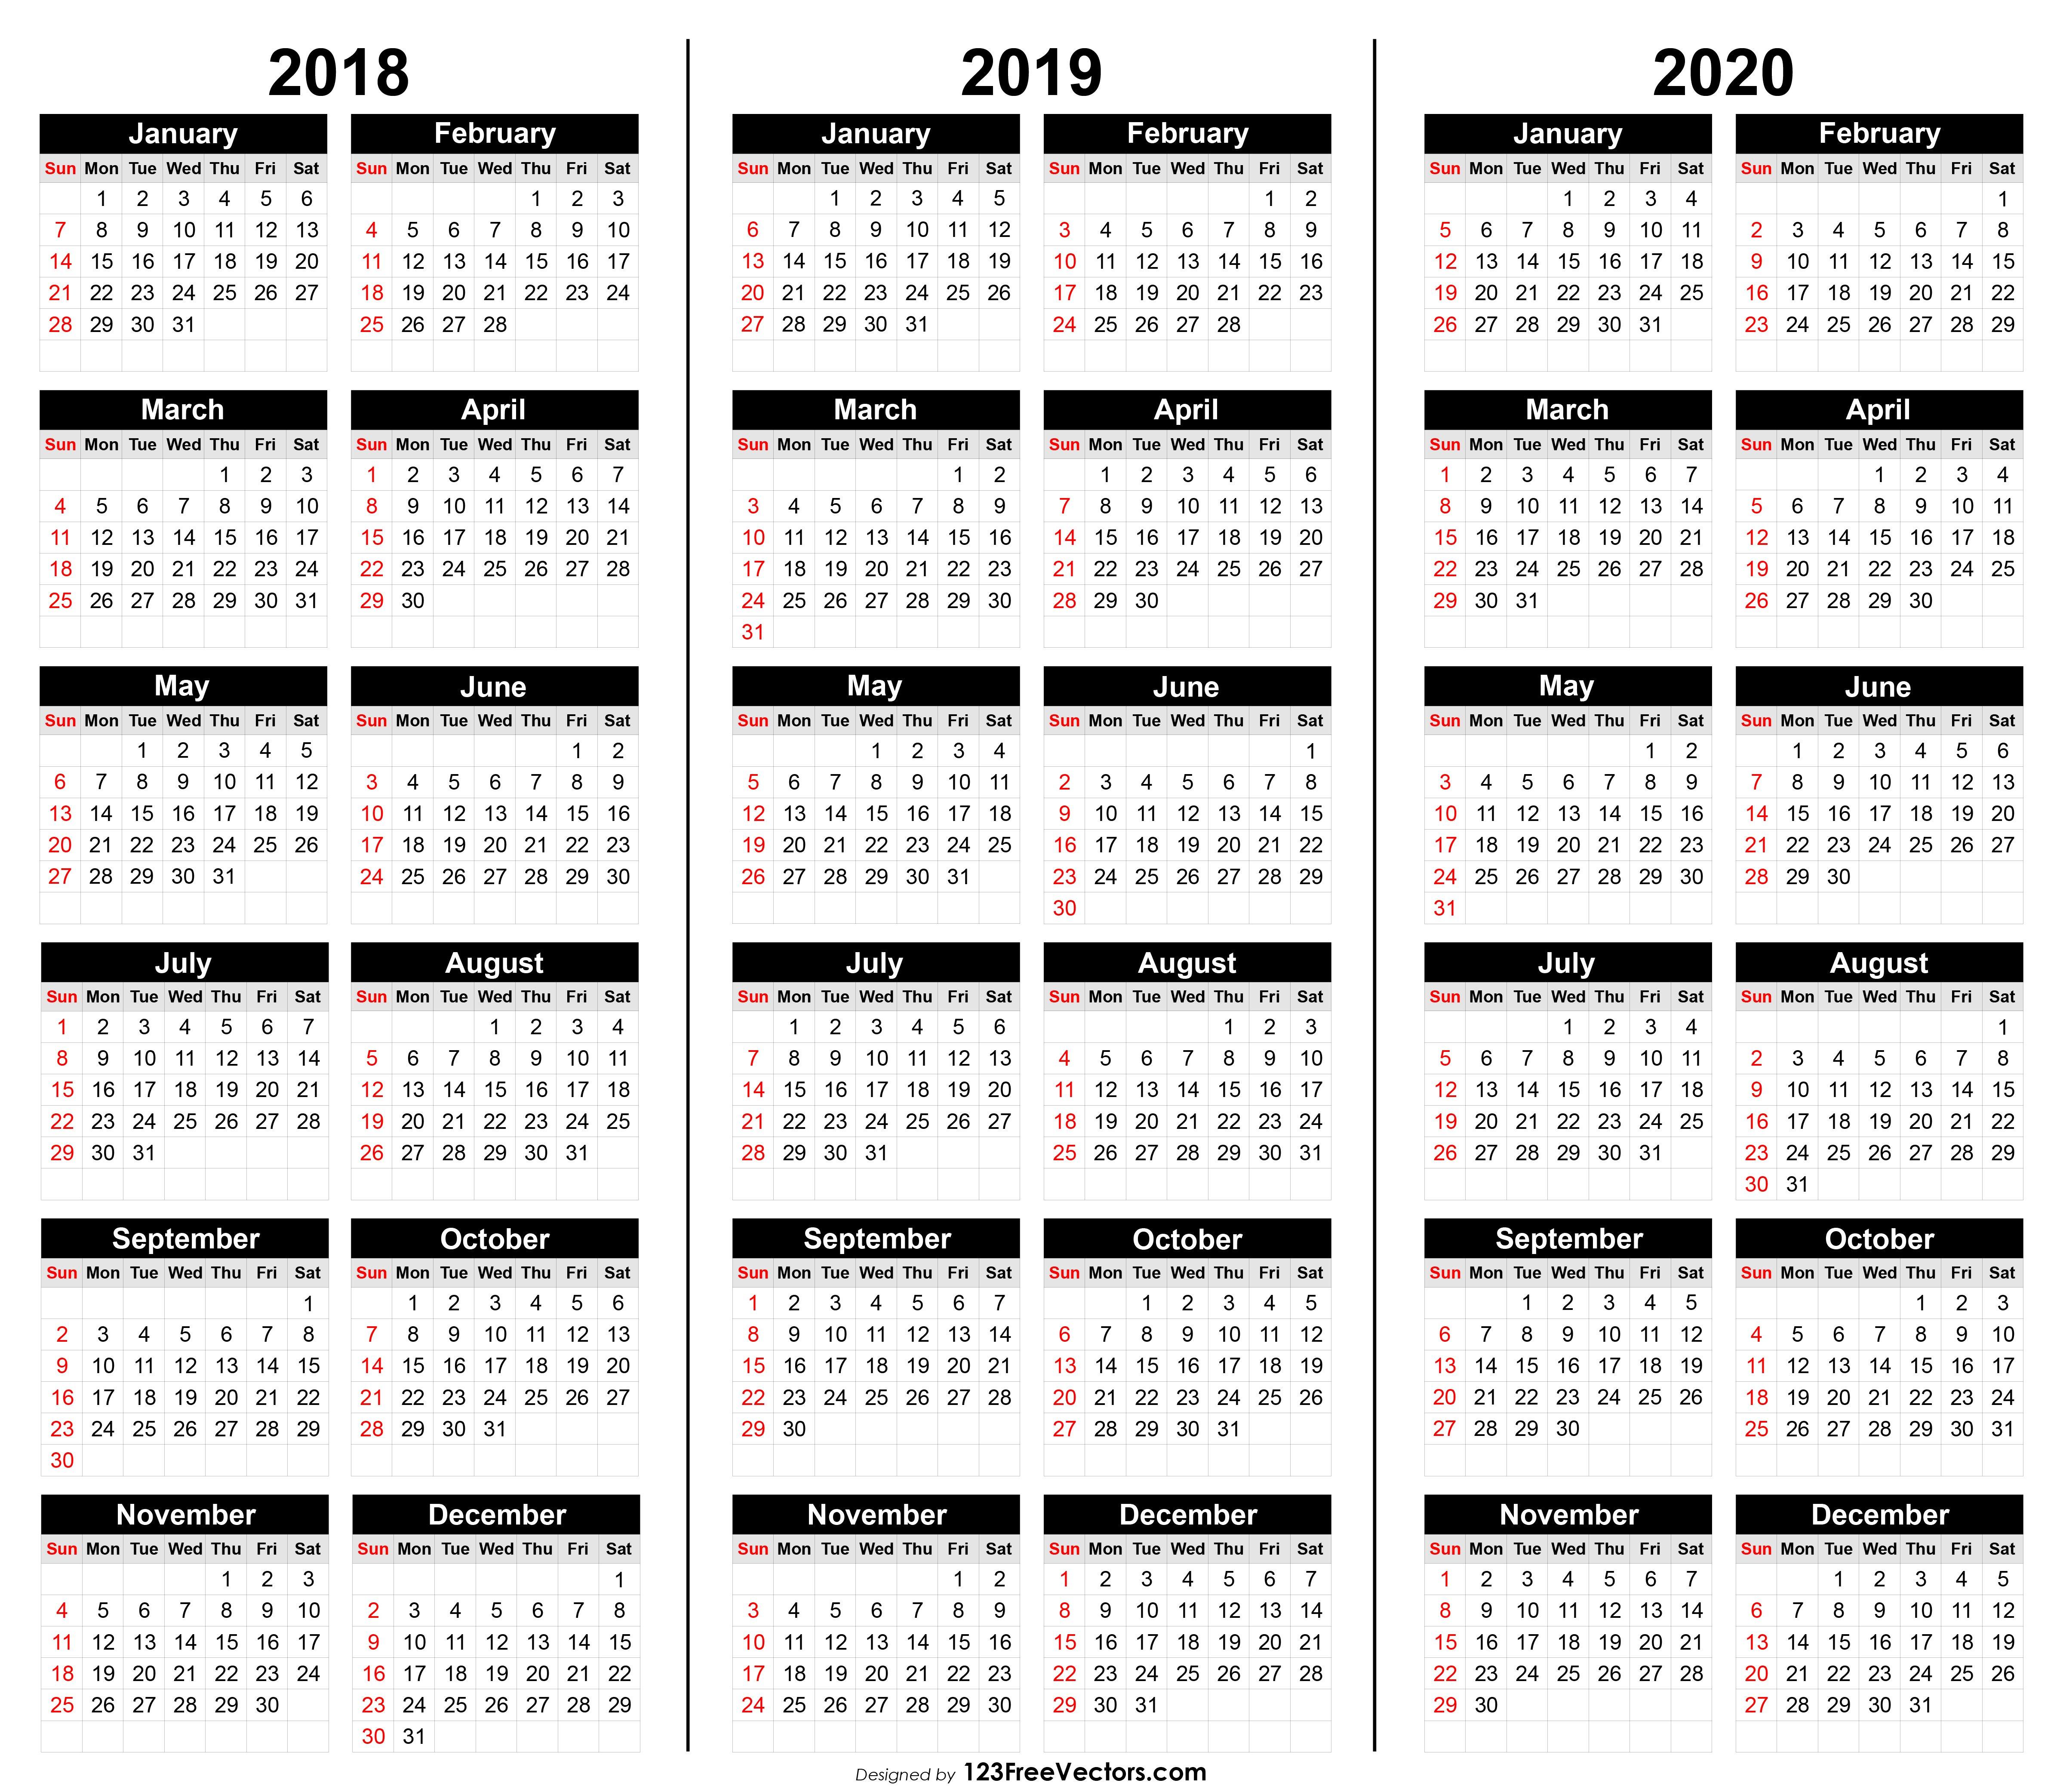 Free 3 Year Calendar 2018 2019 2020 Multi Year Printable Calendars Free